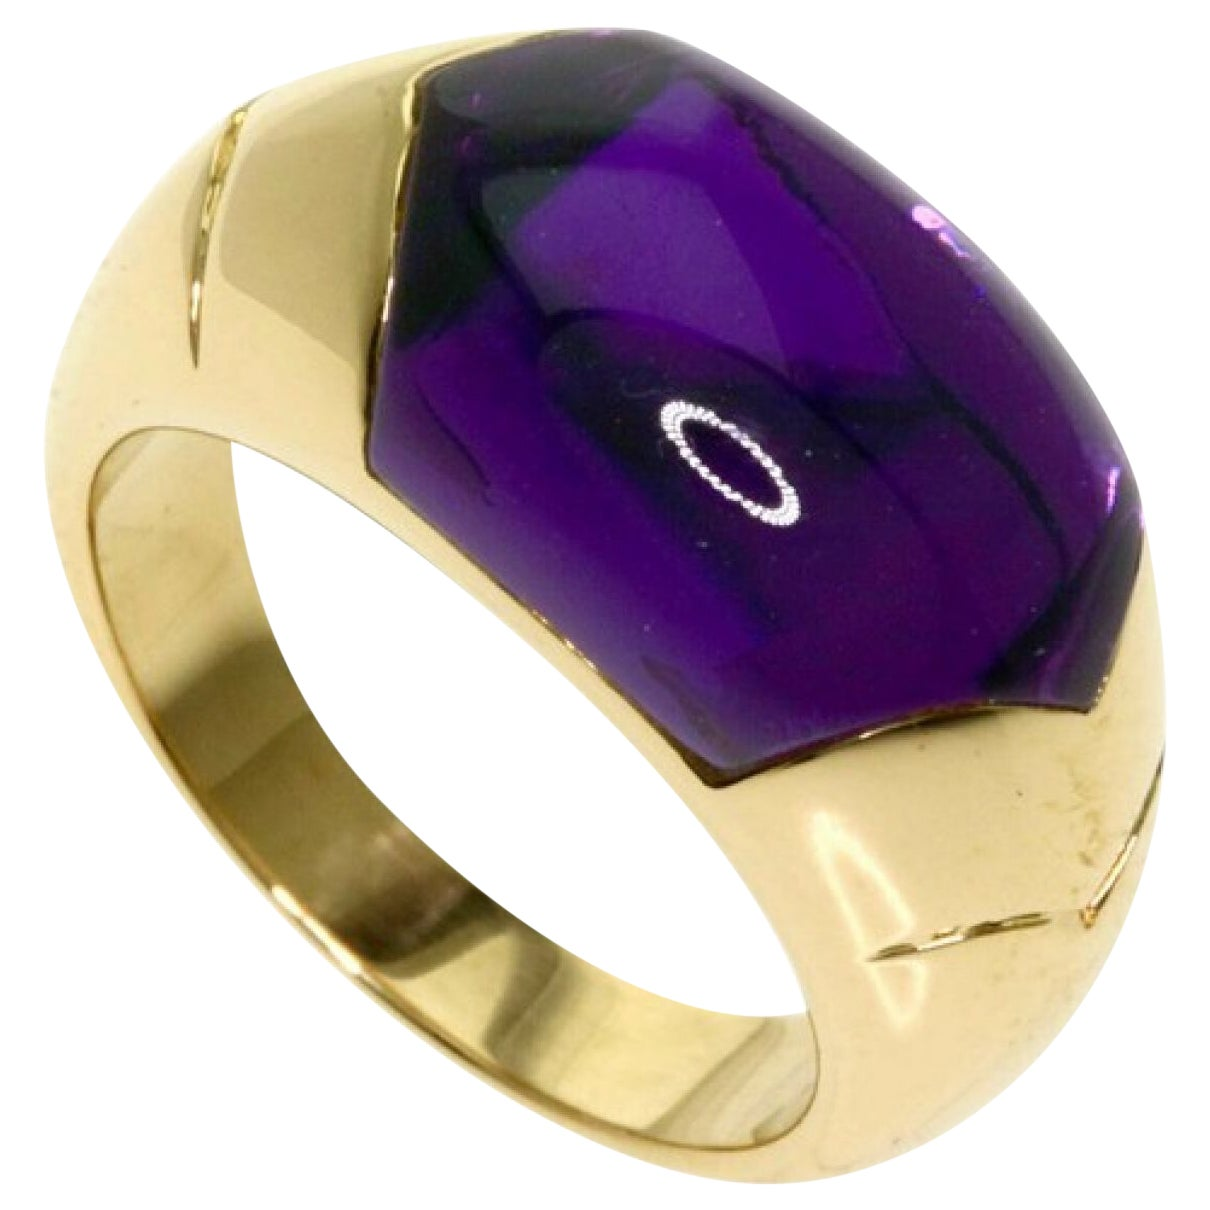 Rare Bvlgari Bulgari Deep Purple Amethyst Certica 18 Karat Yellow Gold Ring